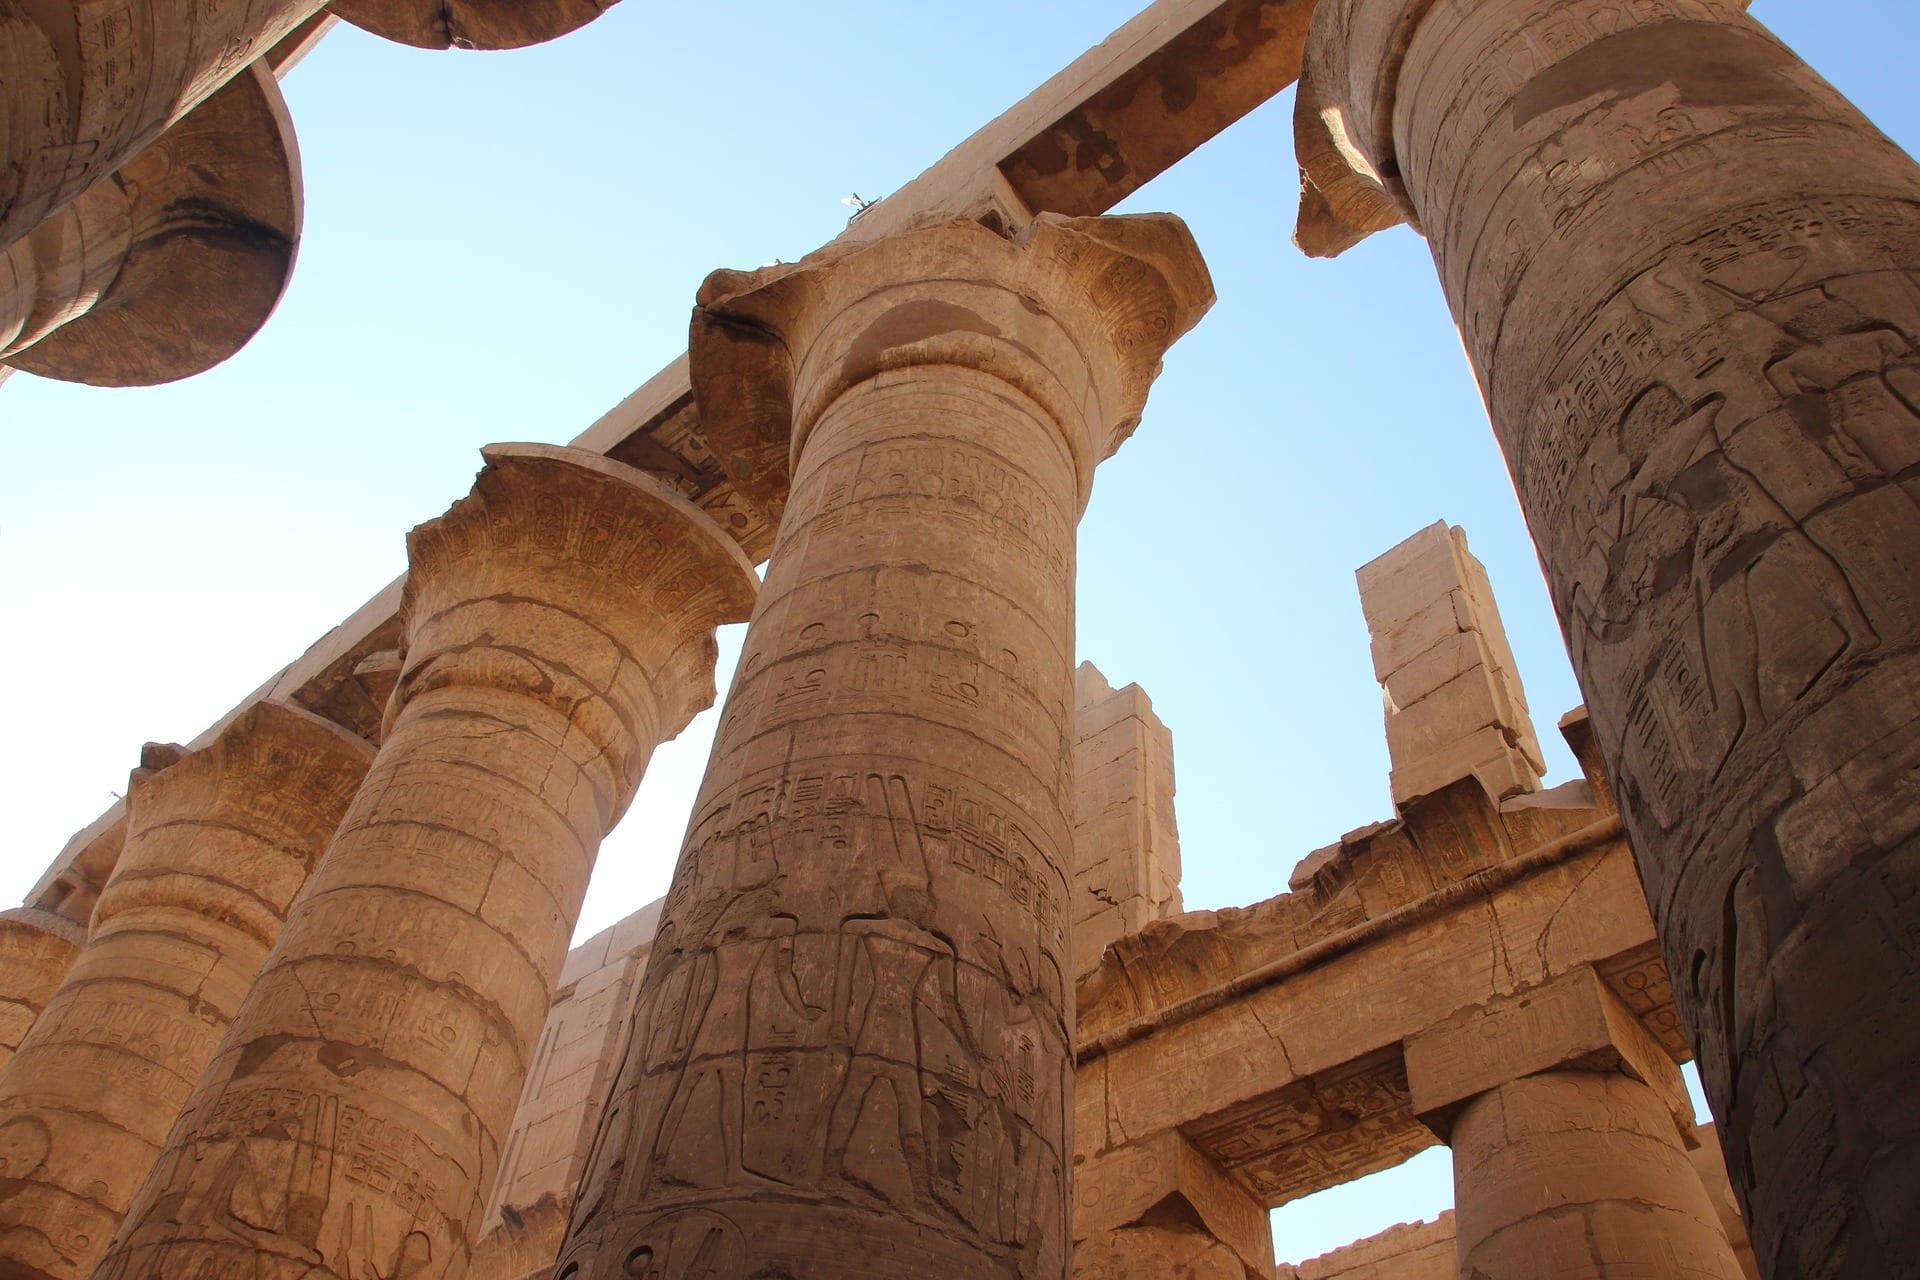 Visiting Egypt 10